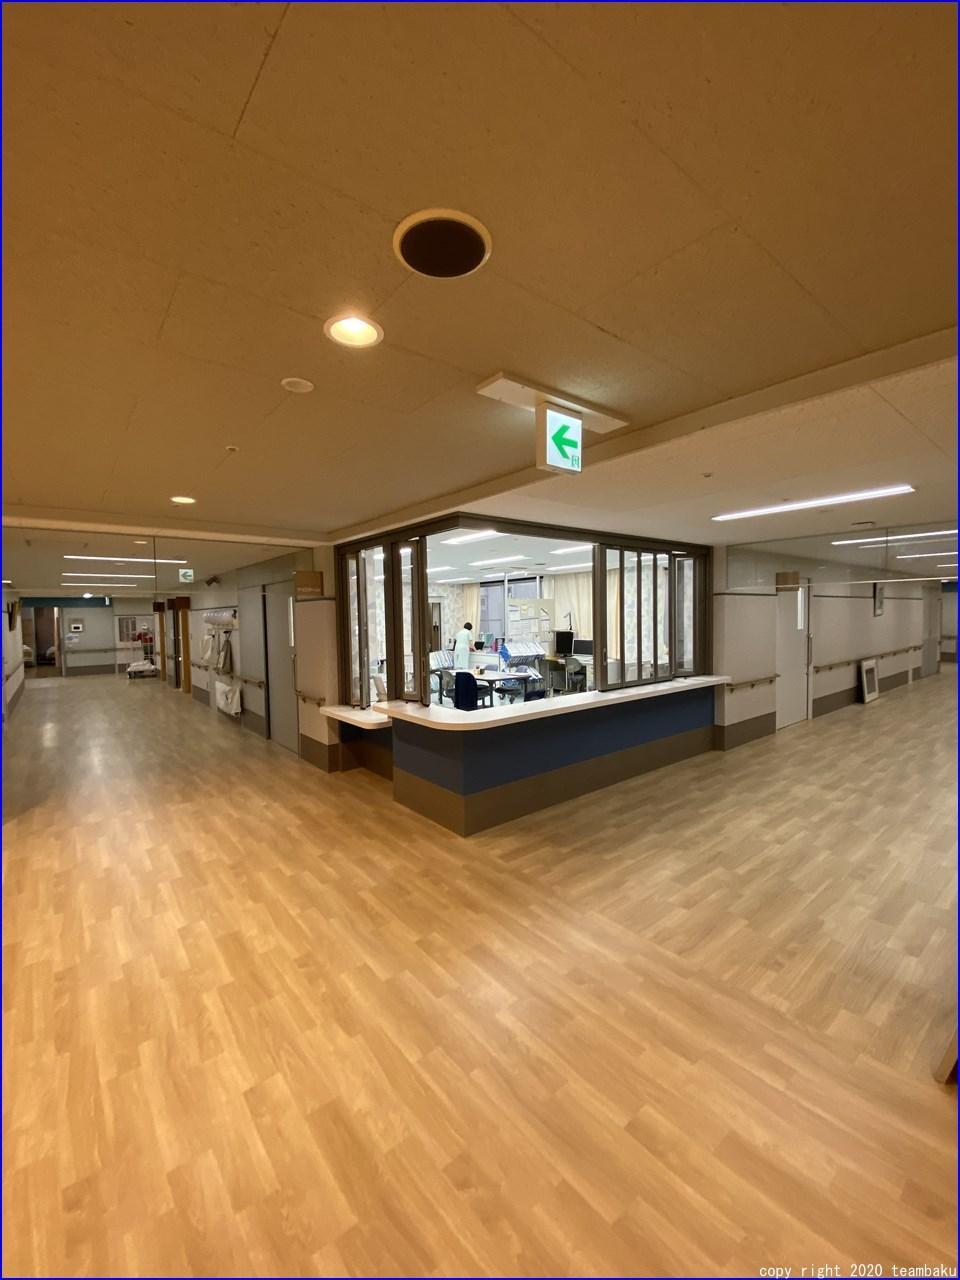 N病院グループ N病院東館 介護医療院 転換改修工事 4_c0376508_10424229.jpg